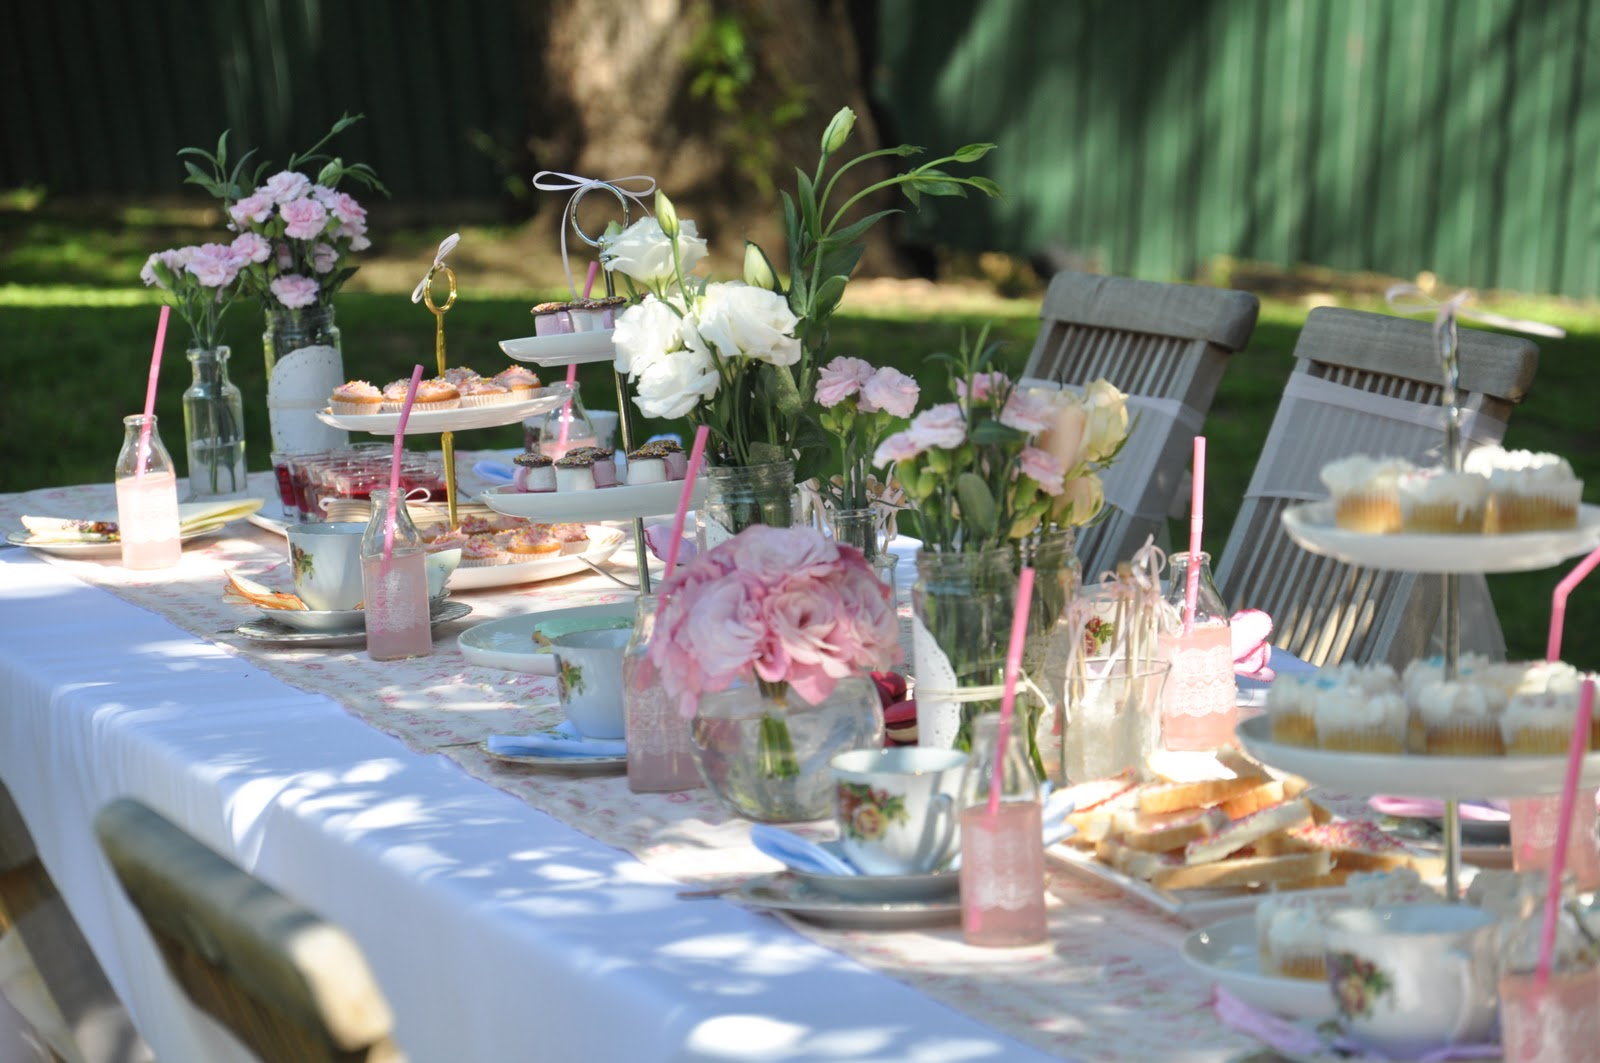 Horsham Conservative Association Annual Garden Party